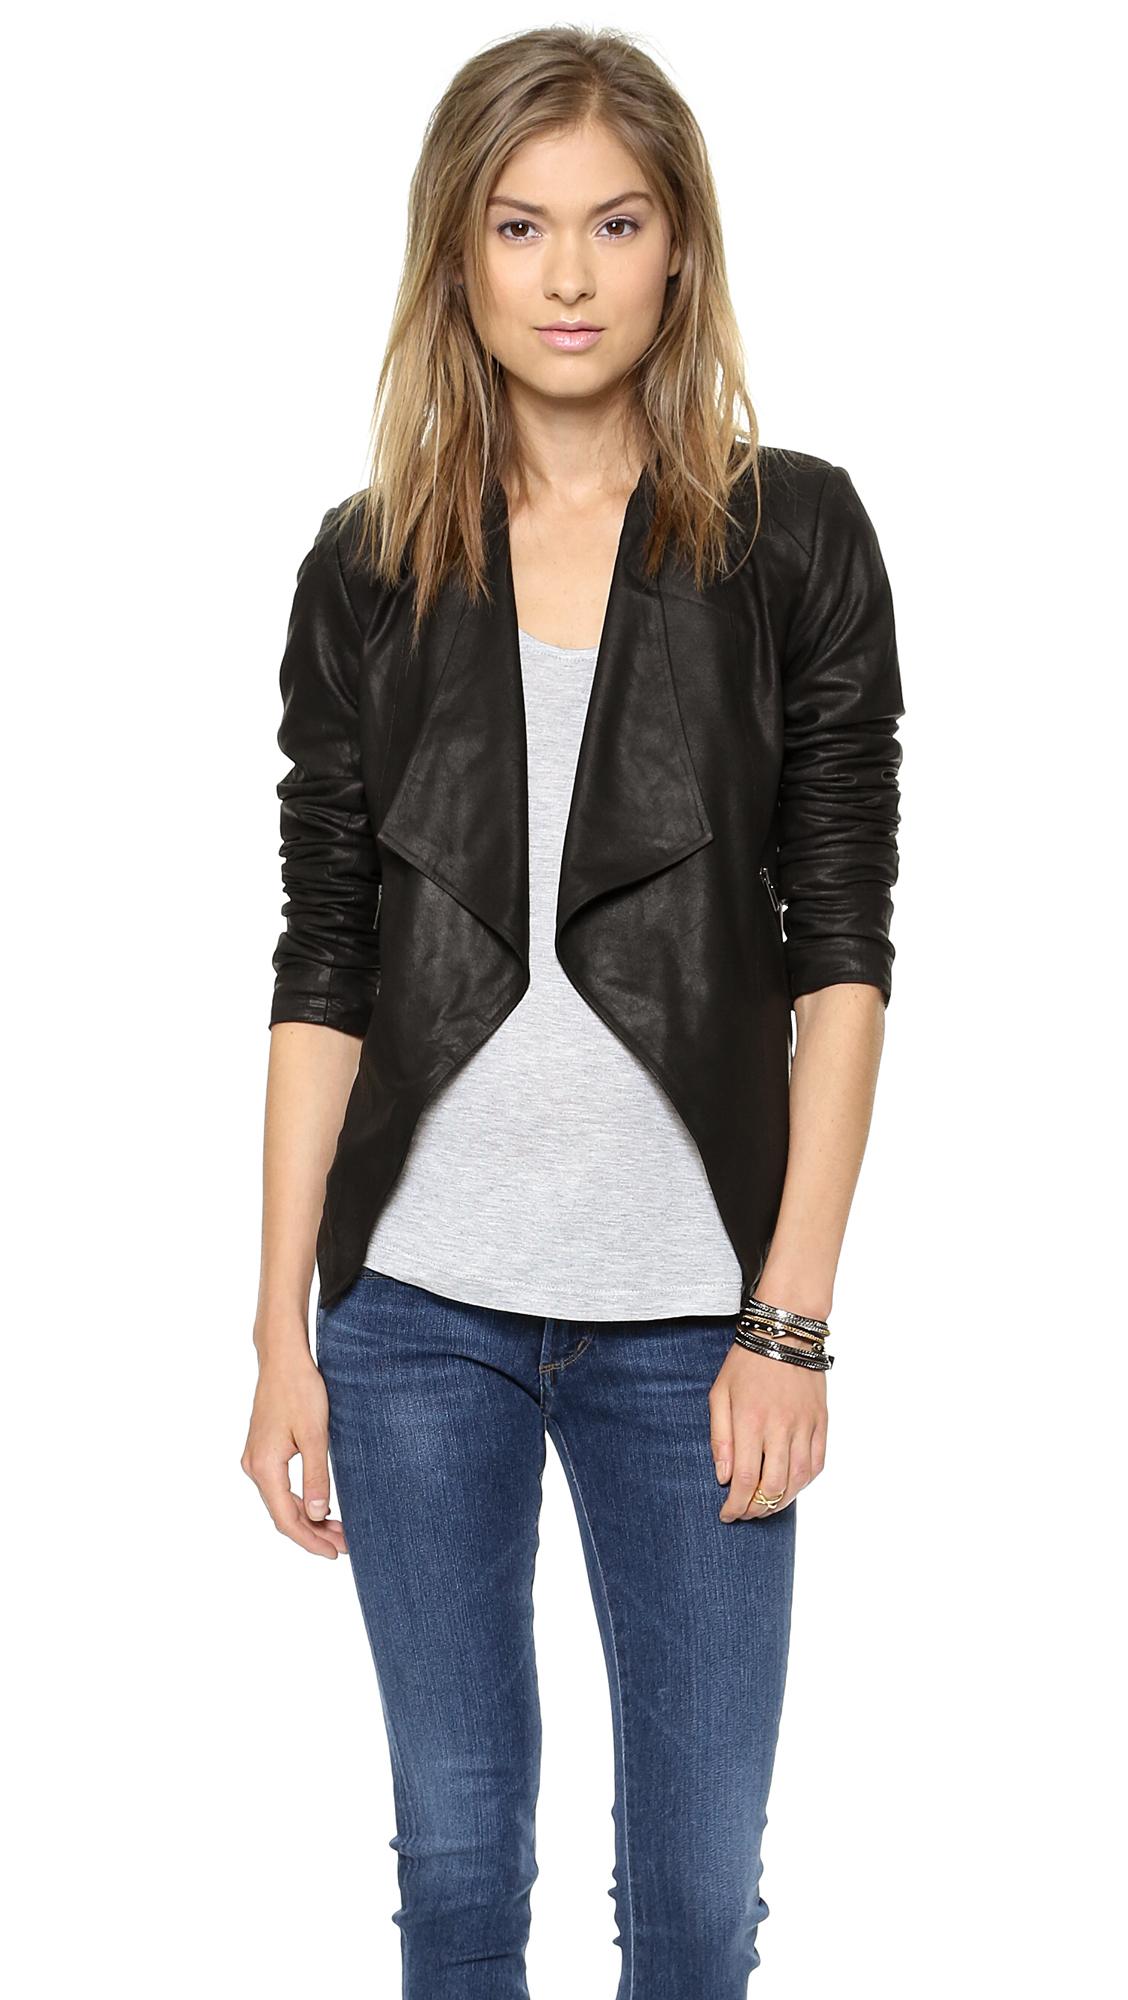 BB Dakota  Tyne Leather Jacket  ($294)